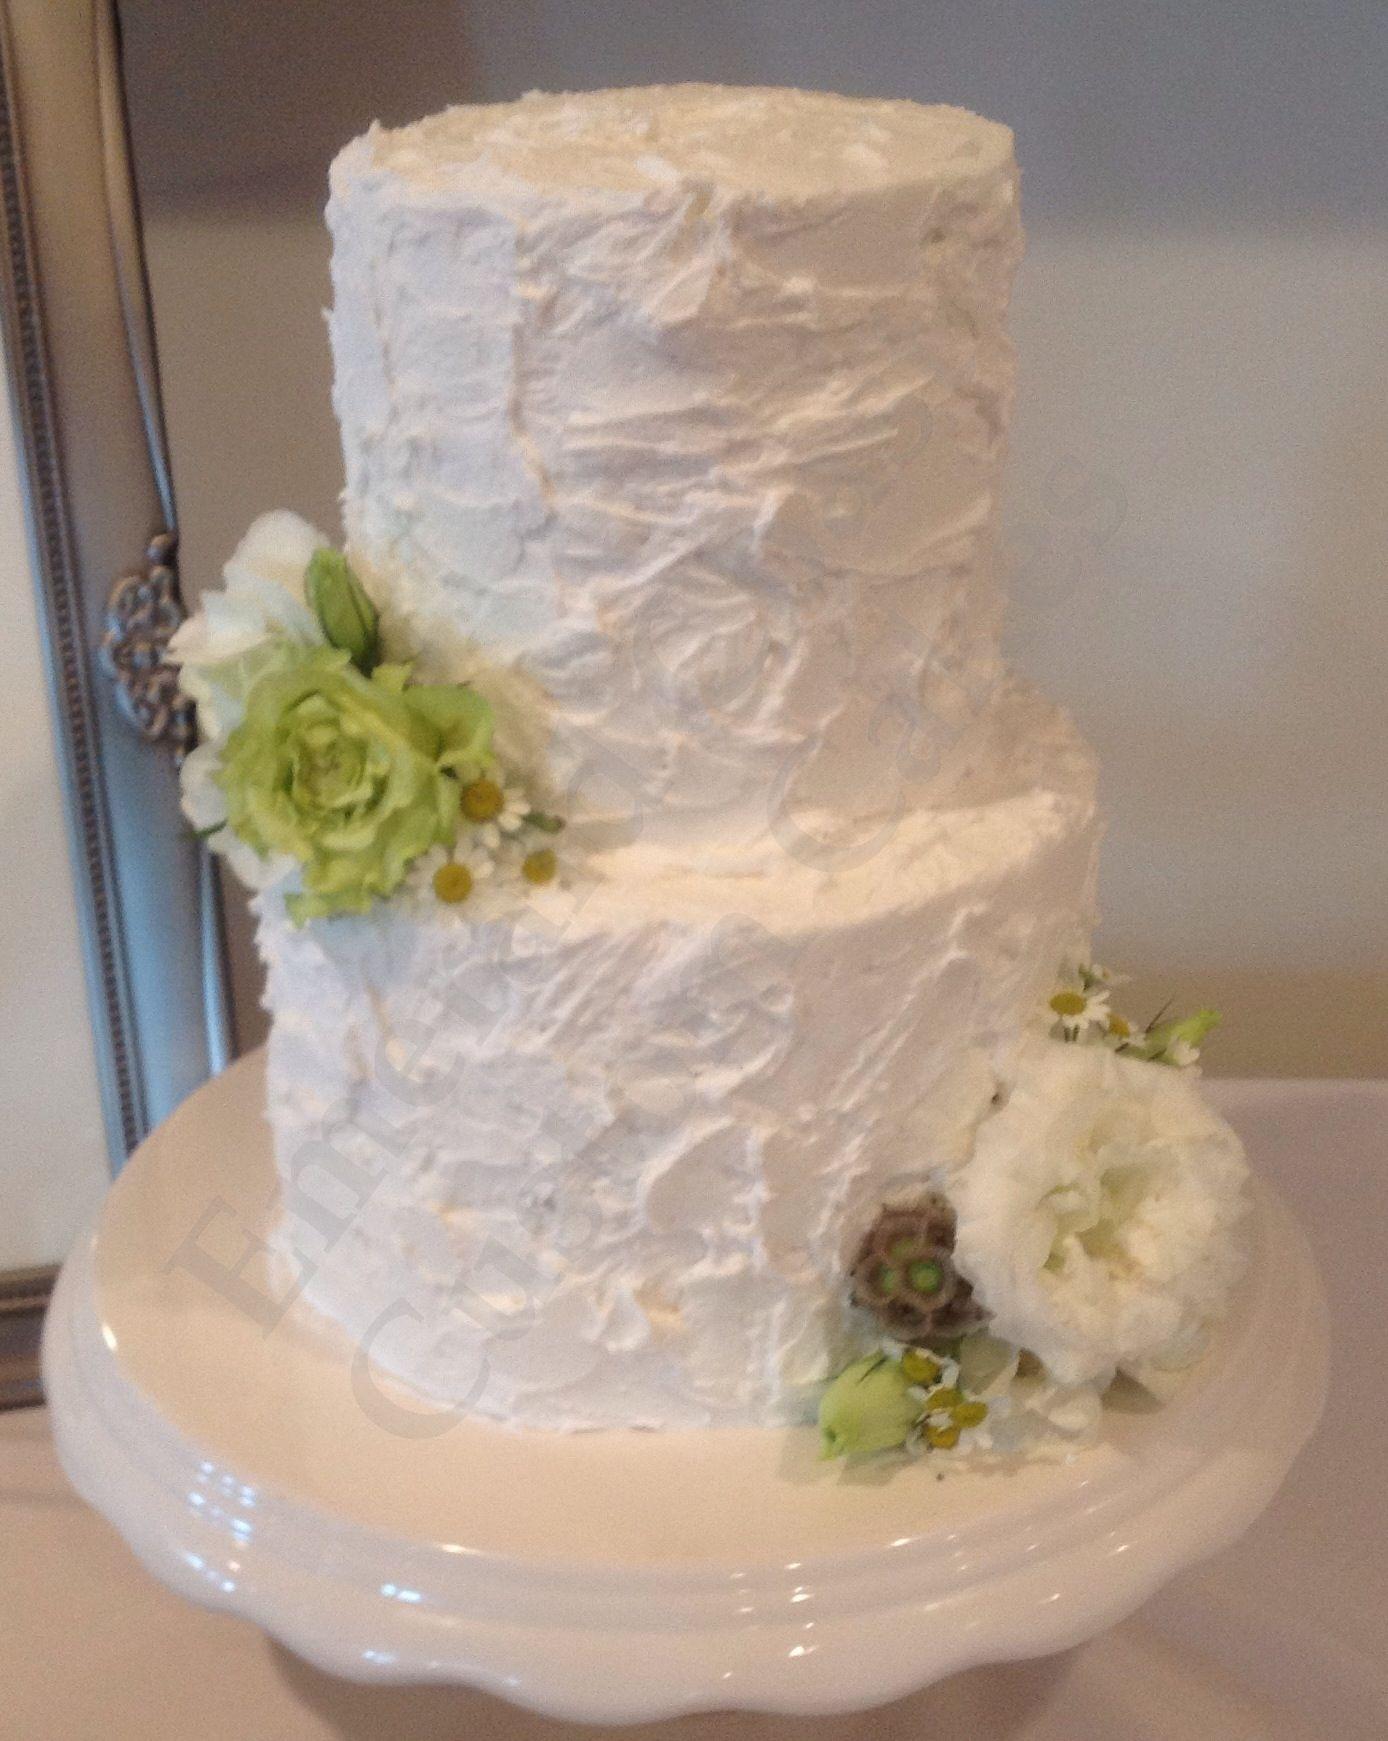 Rustic Wedding Cake By Heather Lester Pelham Of Emerald Coast Custom Cakes Destin Fl